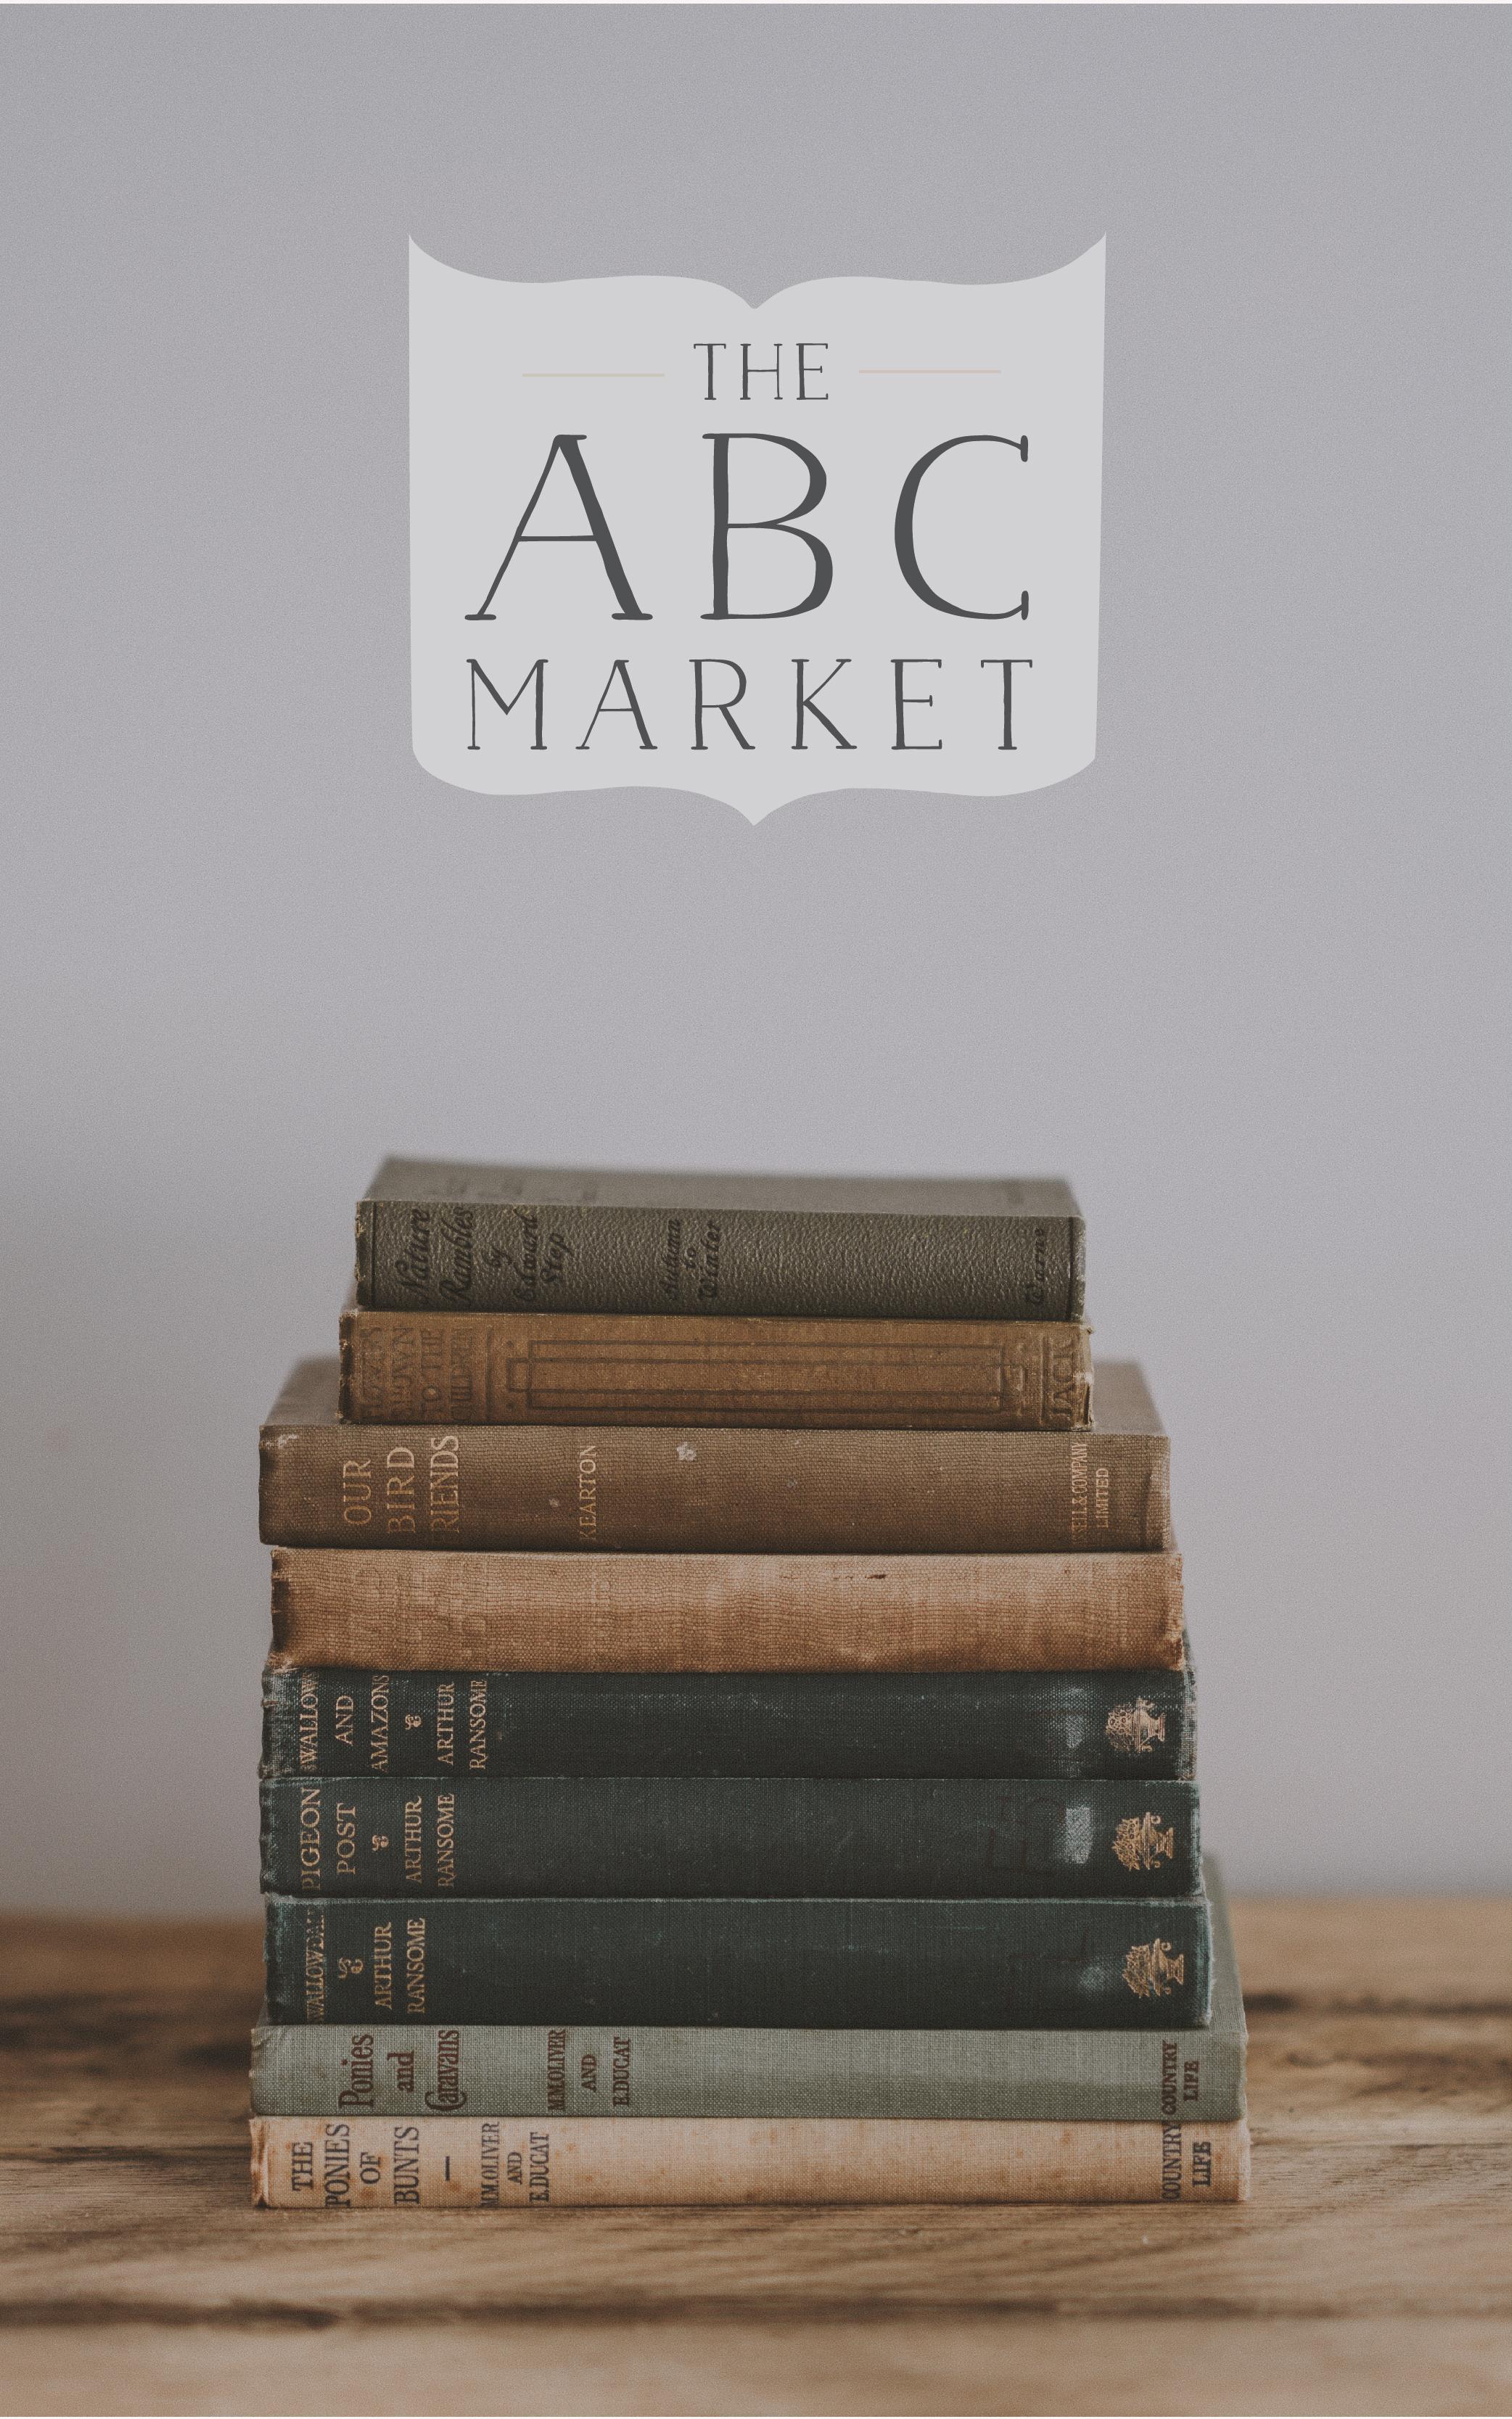 the abc market etsy shop logo